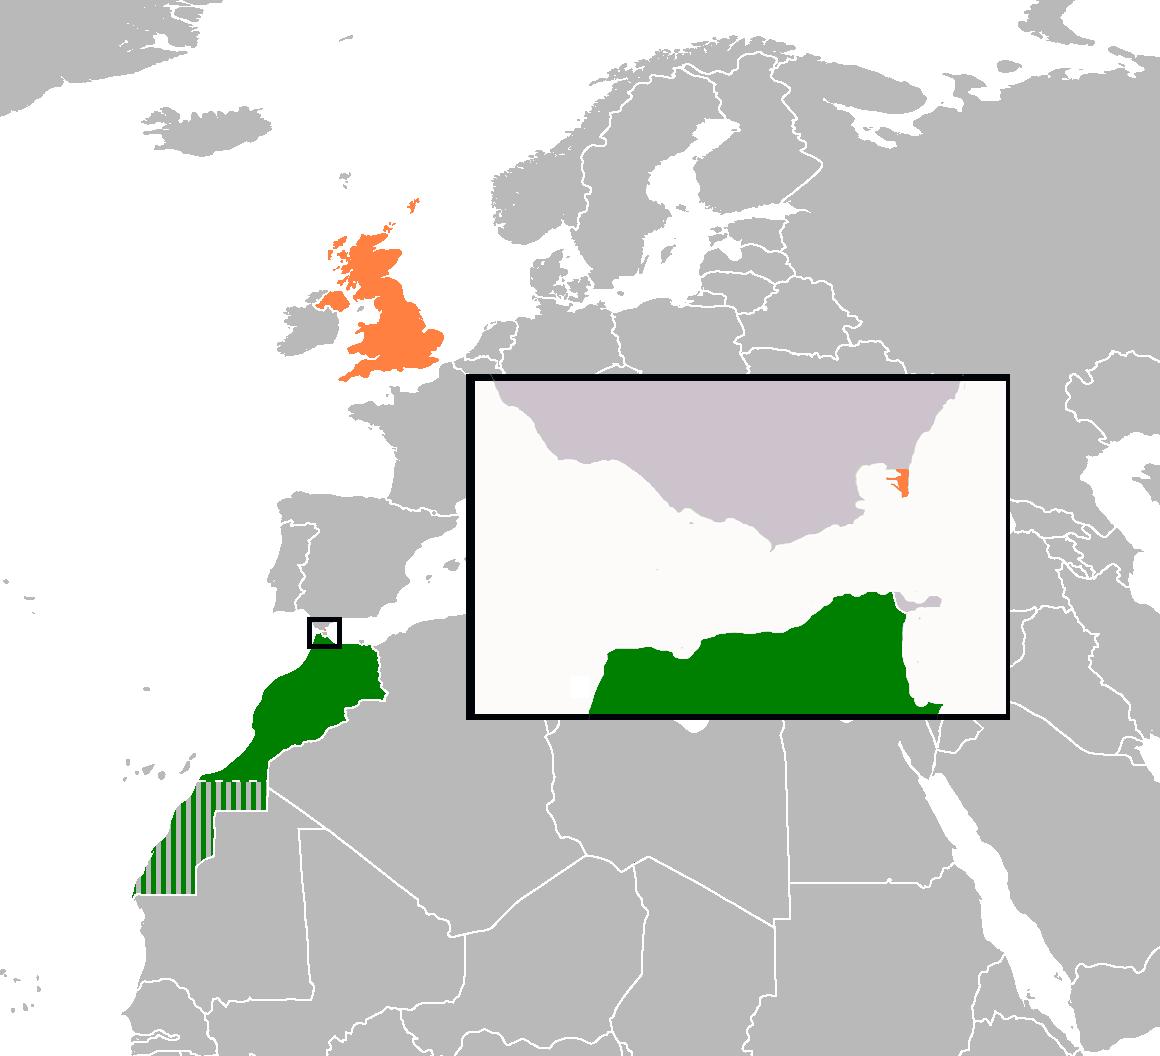 united kingdom states relationship